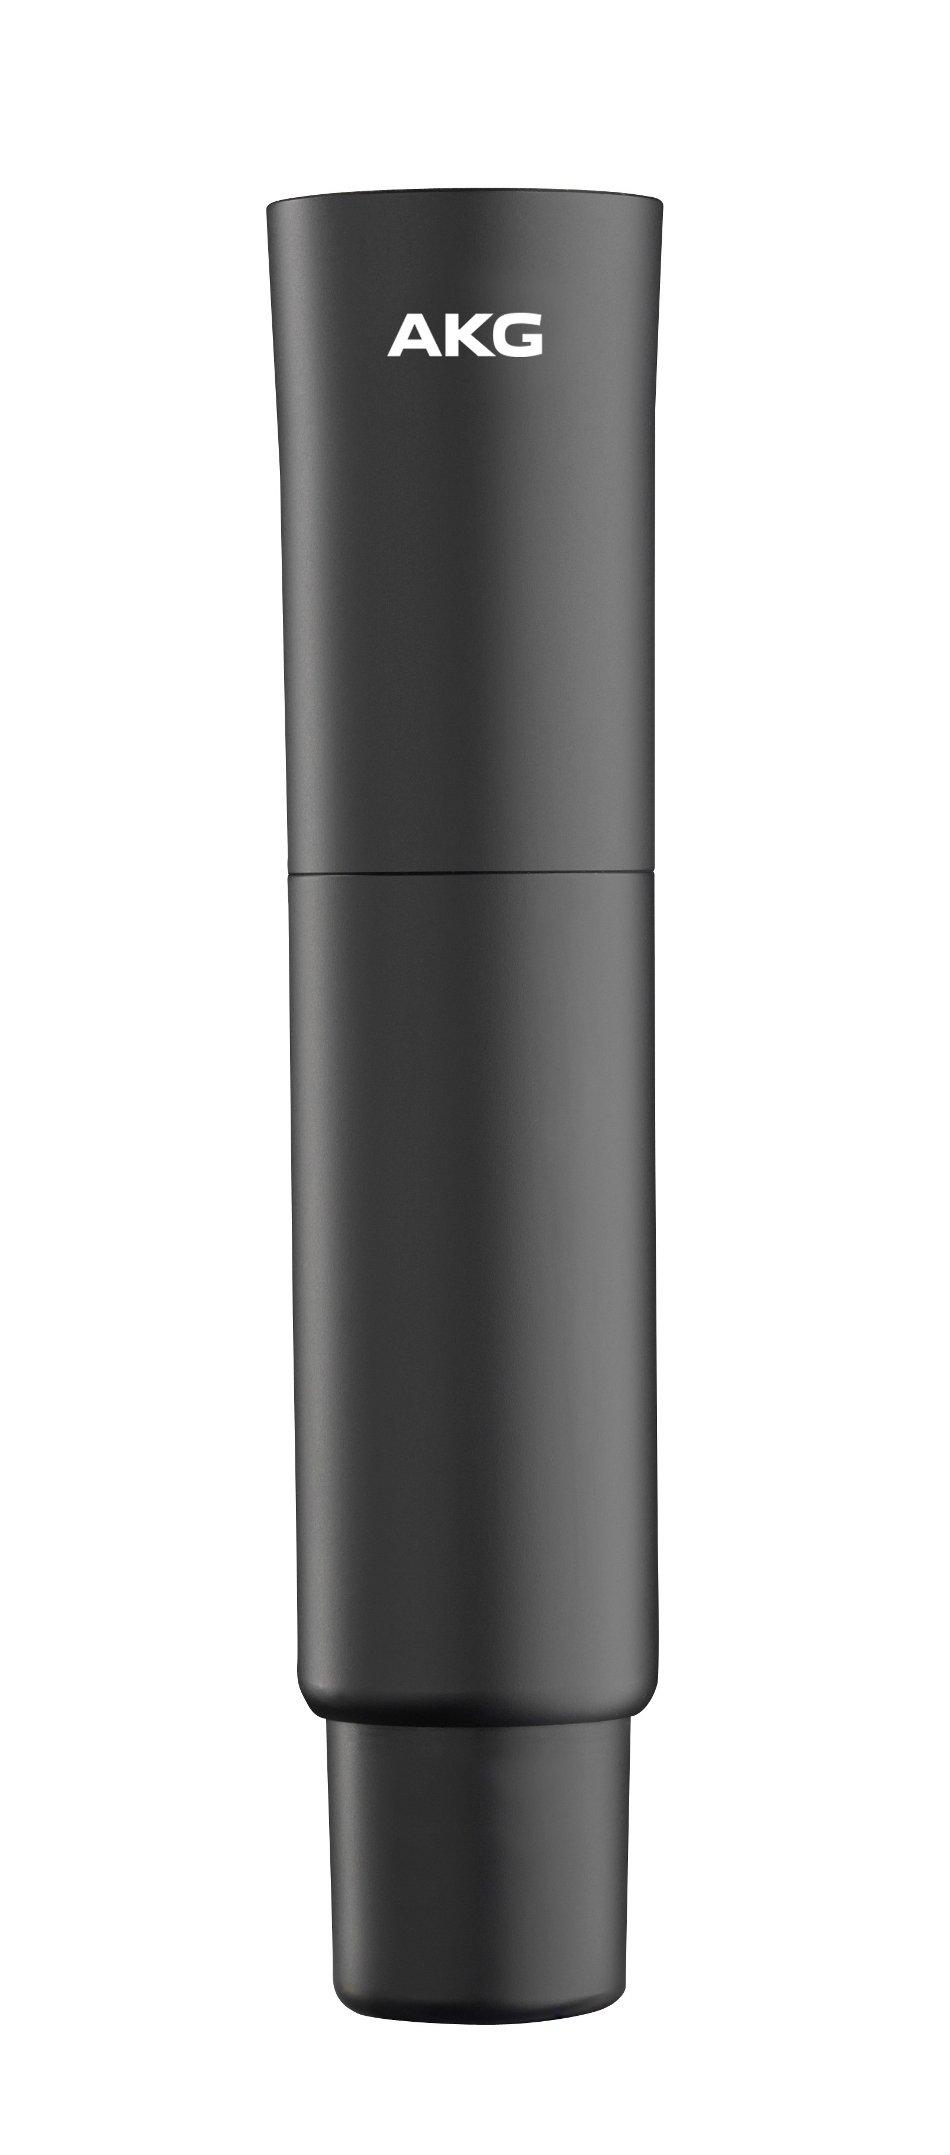 Handheld Transmitter, DMS800 Wireless System